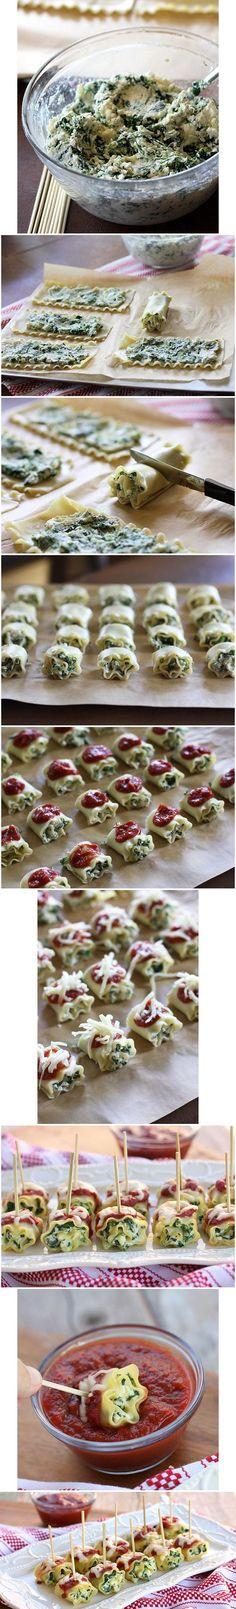 Mini spinach lasagna roll ups